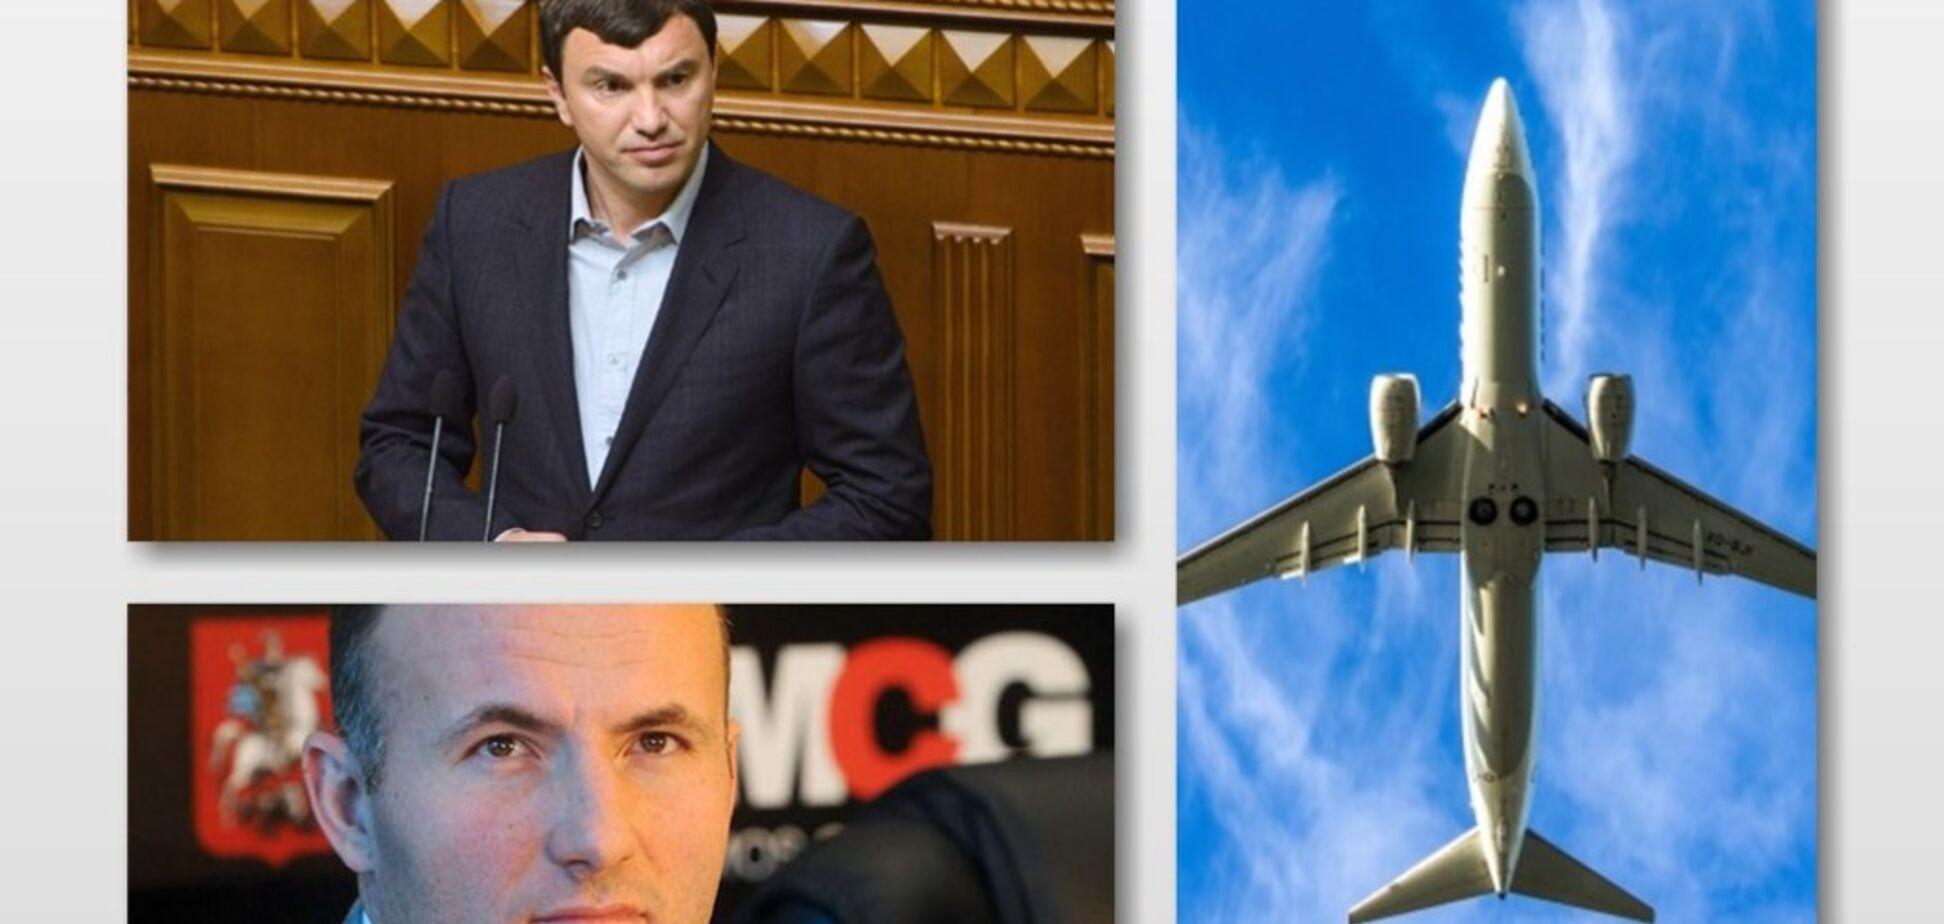 В Мексике задержали олигарха Фукса с украинским нардепом: журналистка ''Схем'' подтвердила